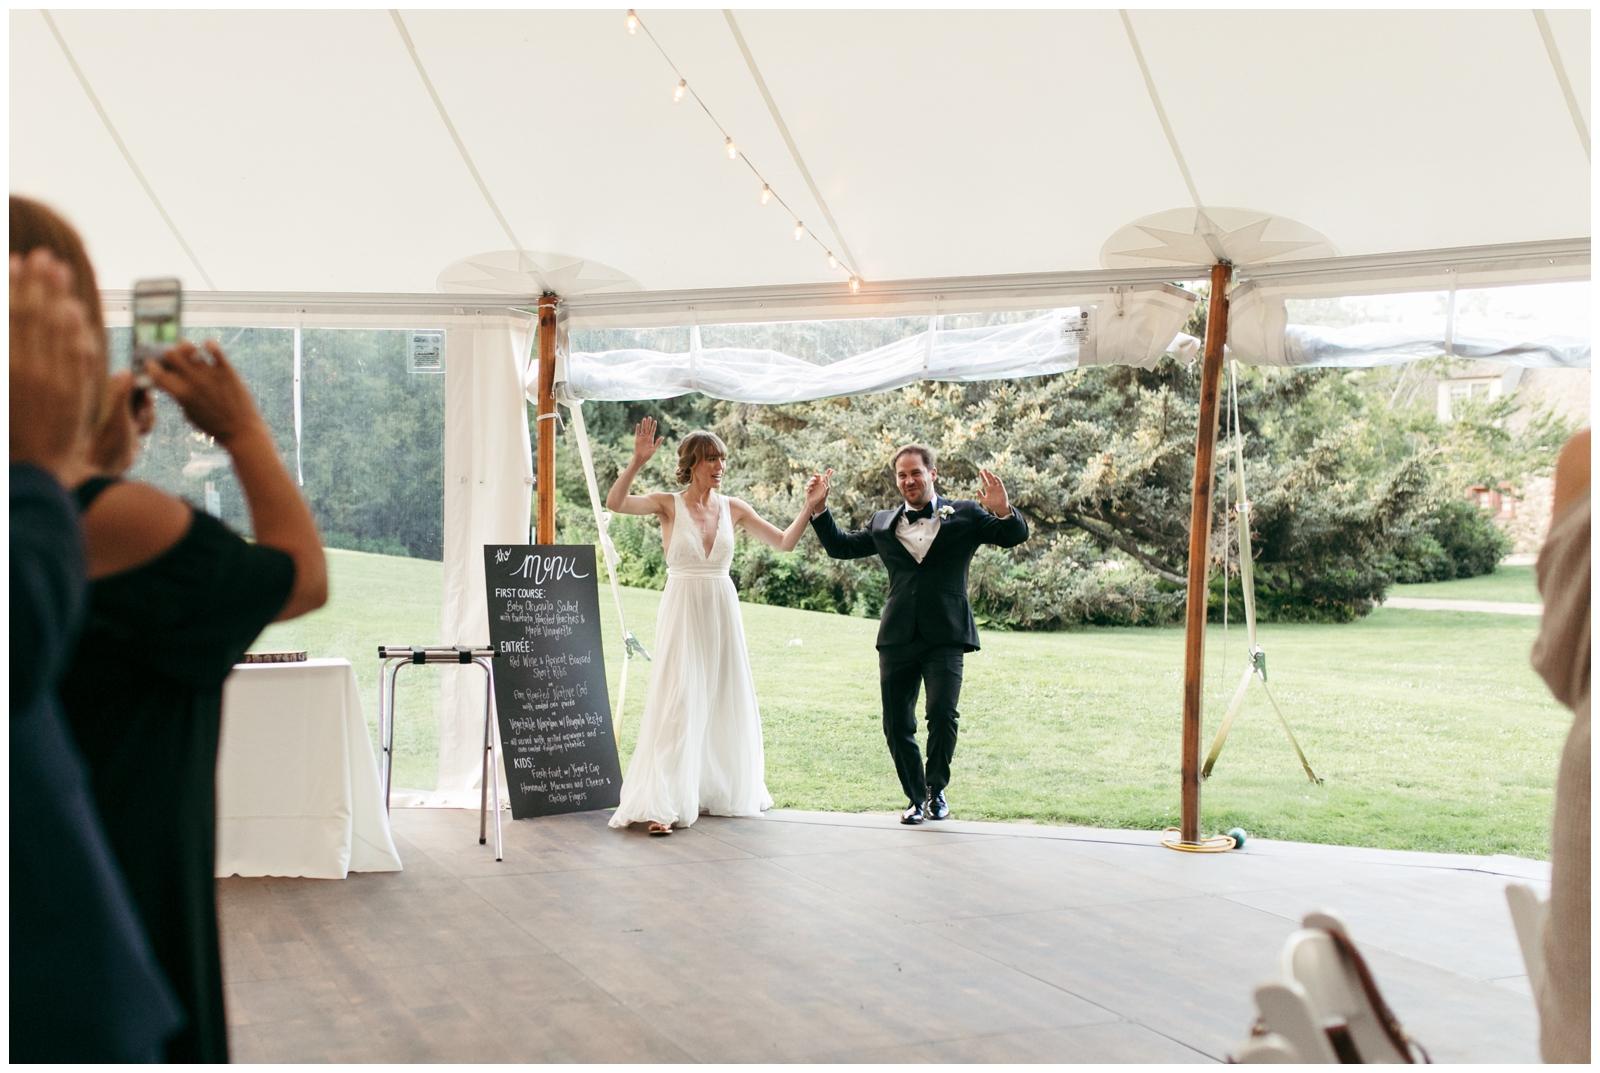 Moraine-Farm-wedding-Bailey-Q-Photo-Massachusetts-wedding-photpgrapher-113.jpg